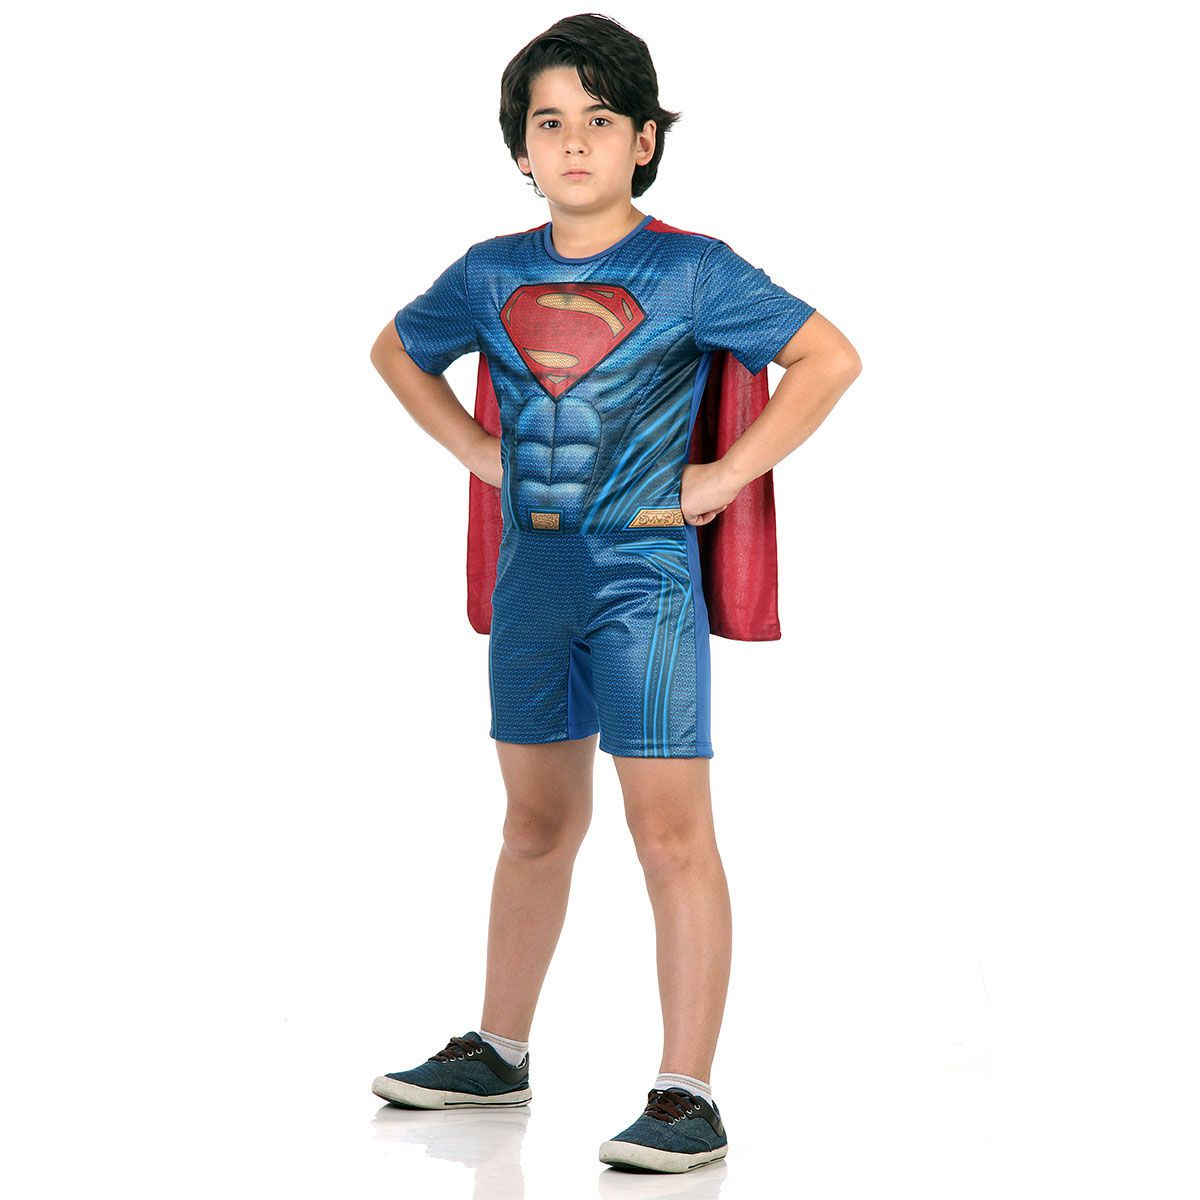 Fantasia Super-Homem Infantil com Capa